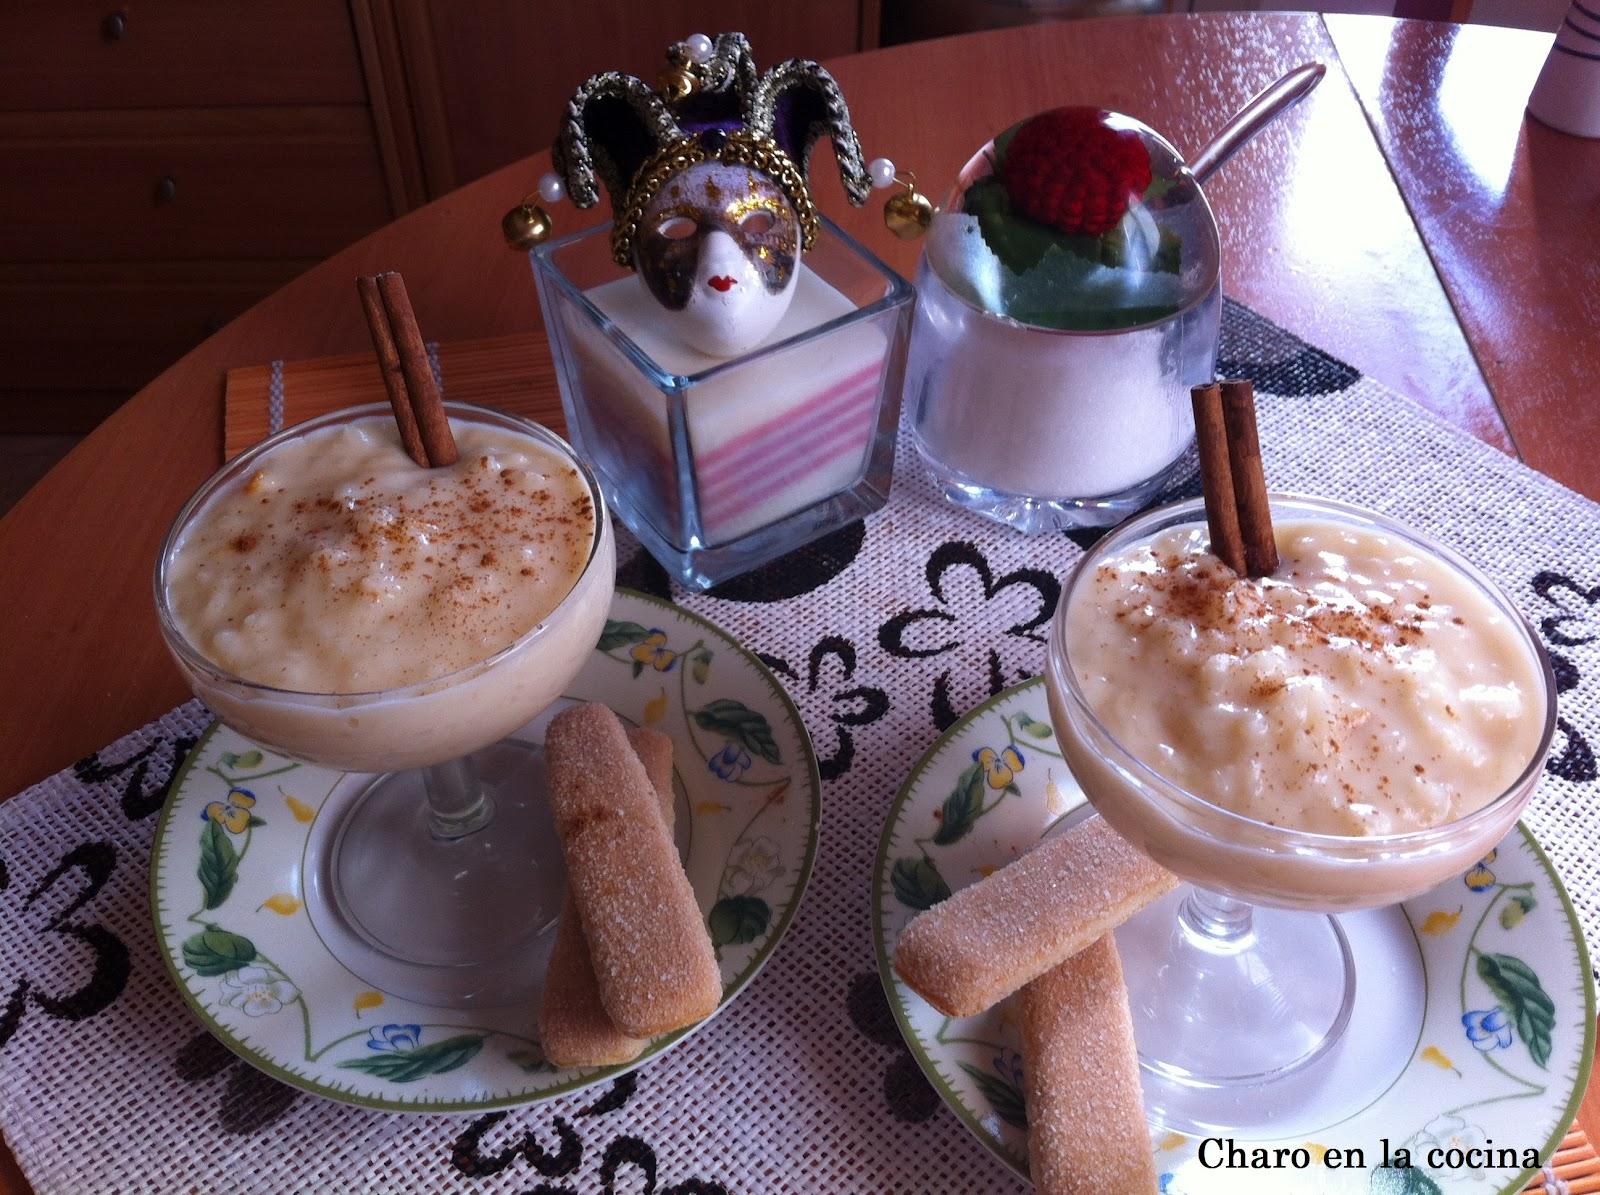 Charo en la cocina arroz con leche en olla express - Judias pintas con arroz olla express ...